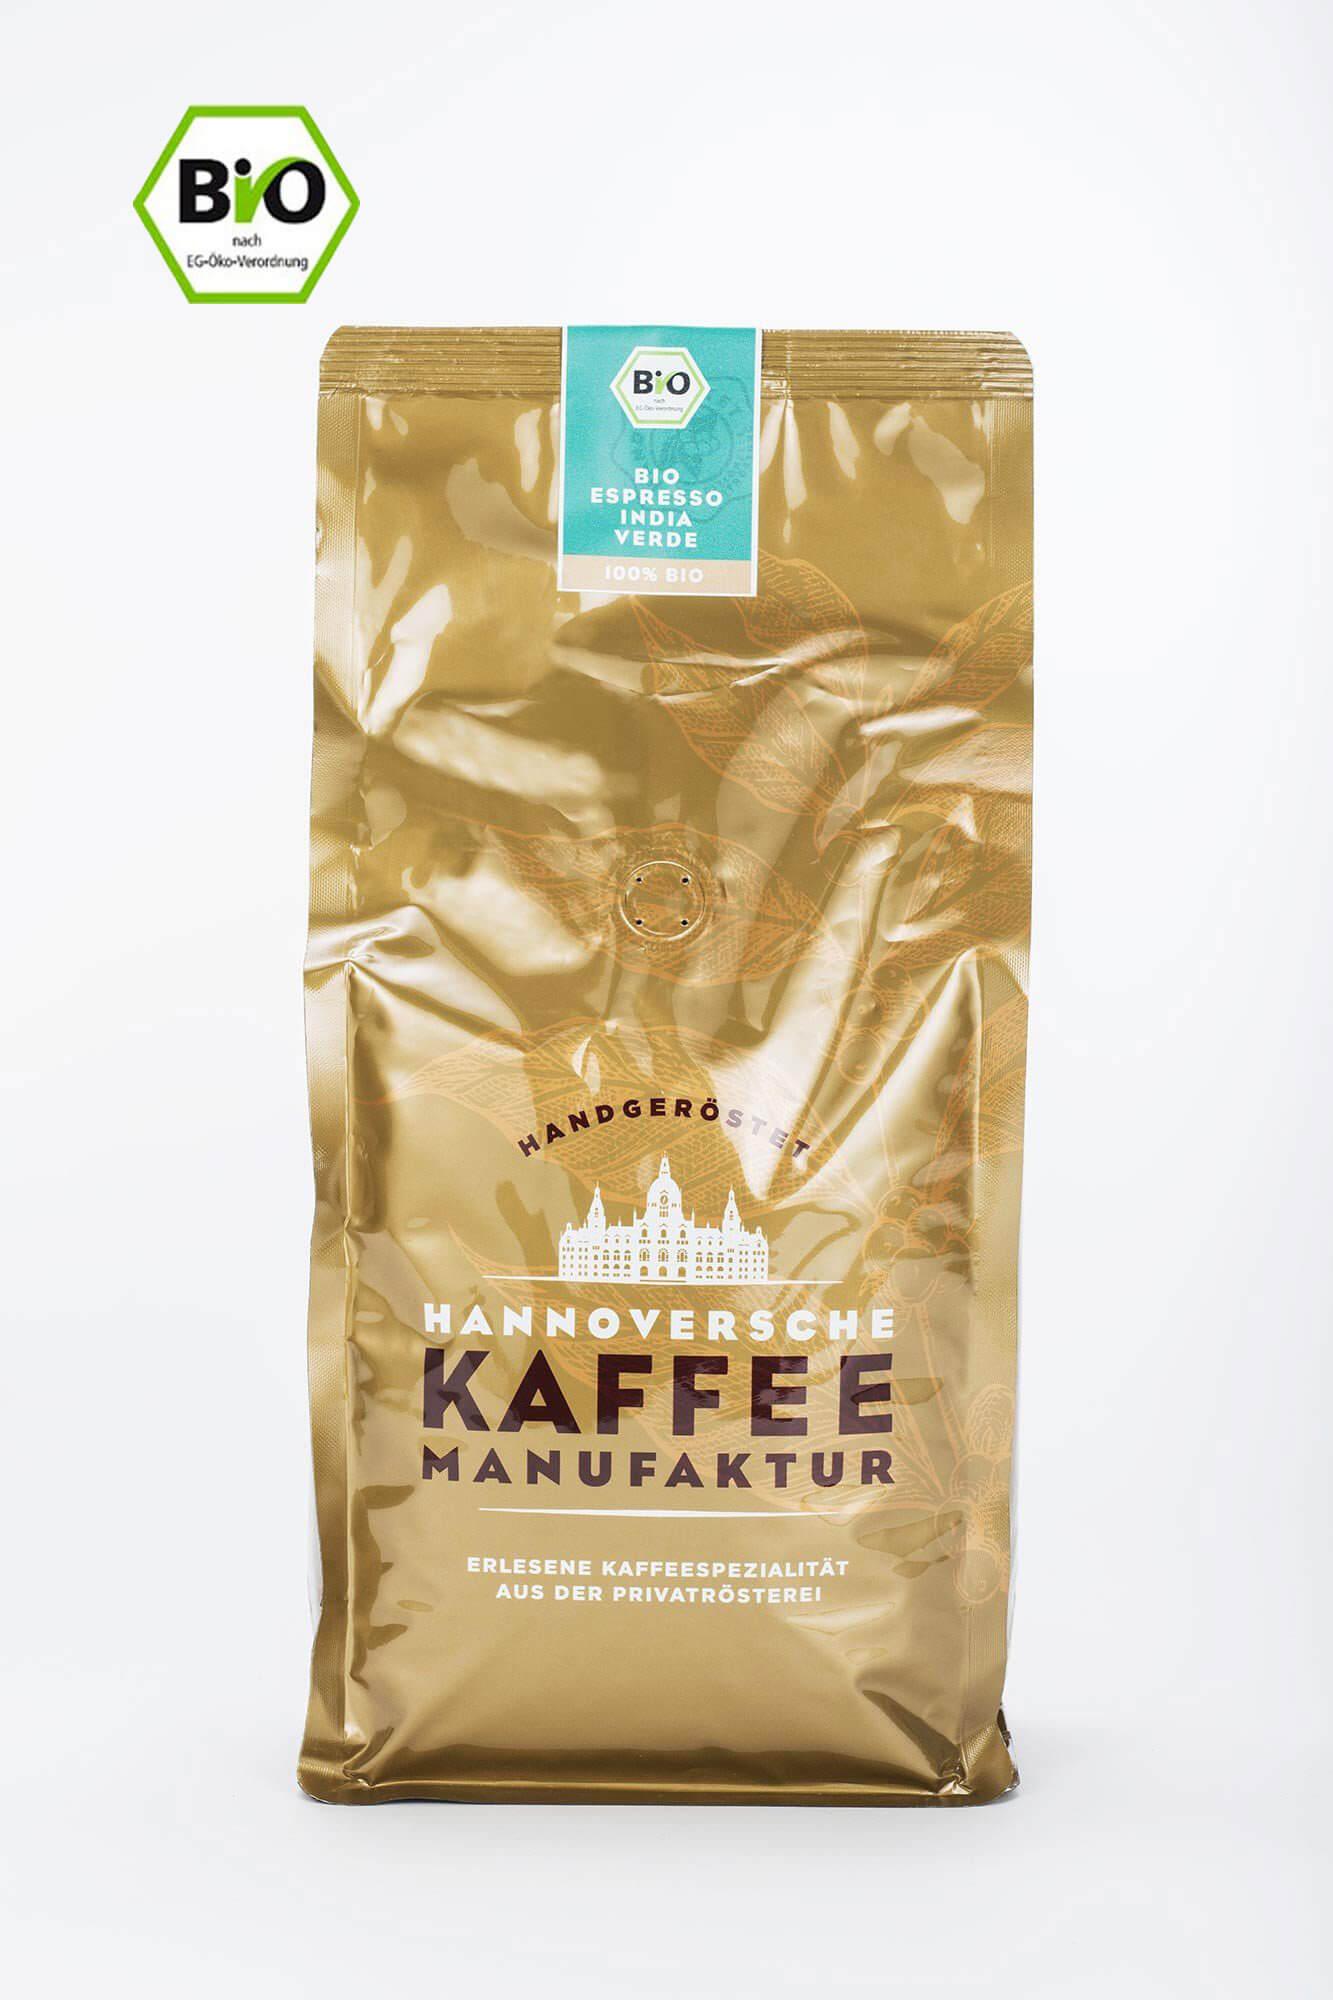 hannoversche kaffee manufaktur bio espresso india verde online kaufen roast market. Black Bedroom Furniture Sets. Home Design Ideas